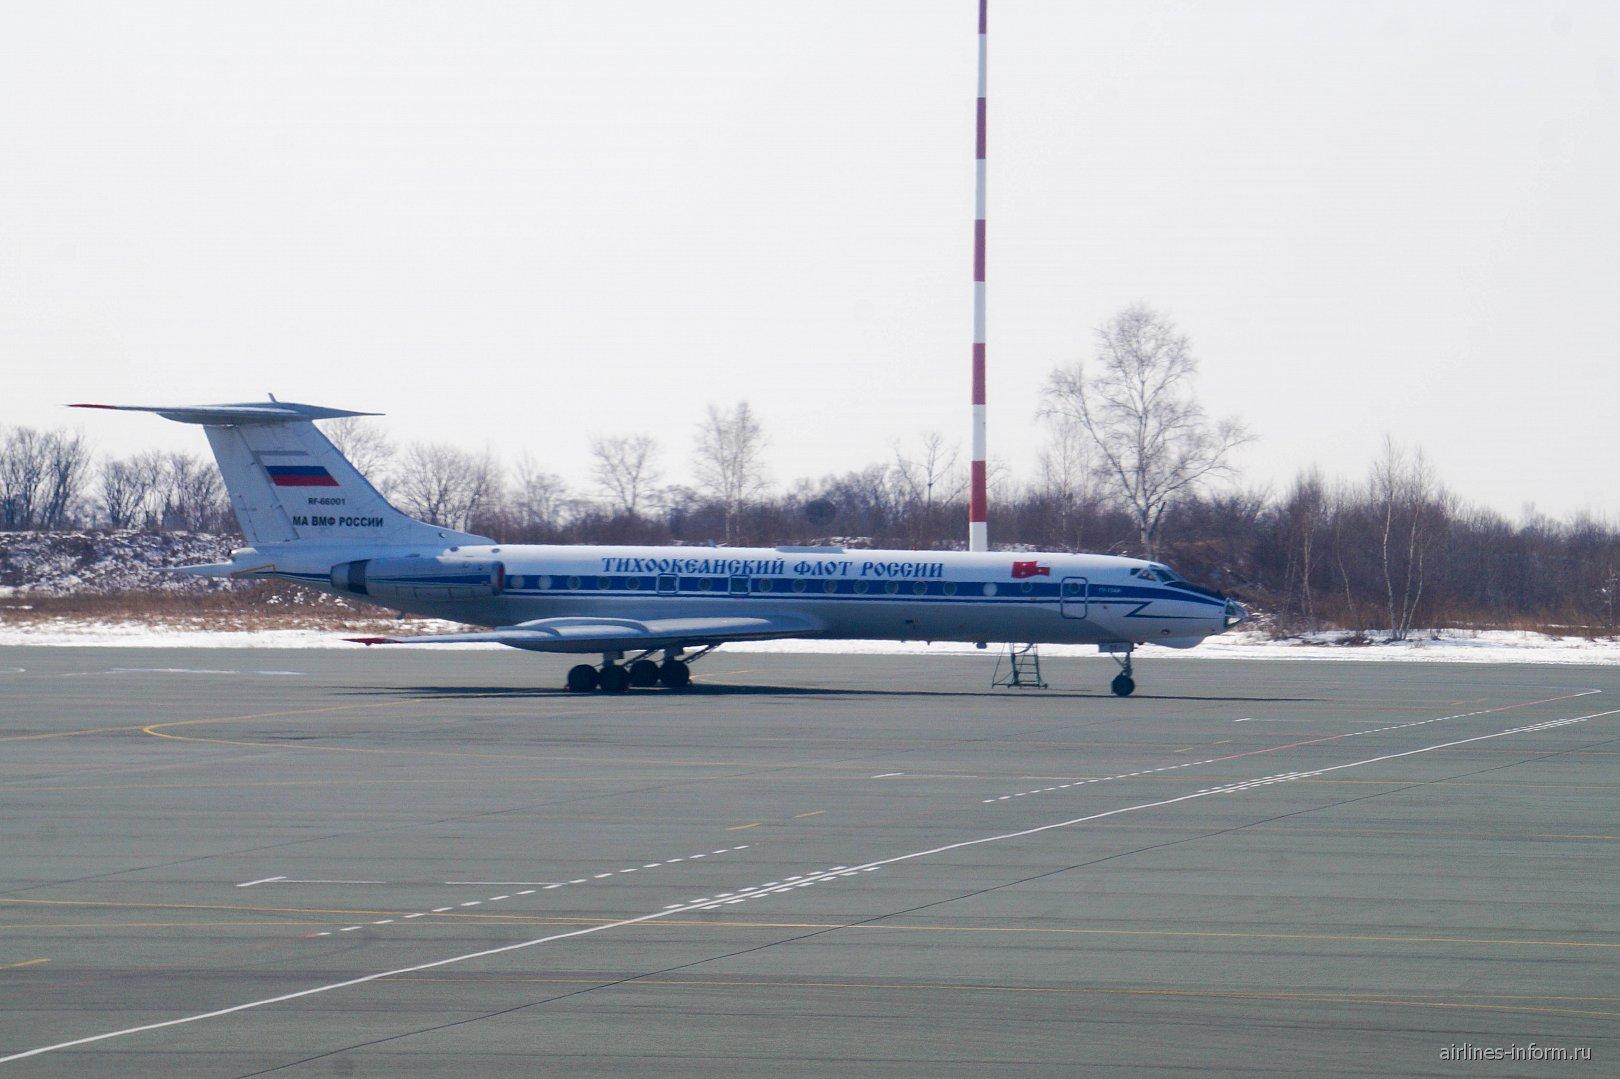 ��-134�� RF-66001 ��� ������ � ��������� ������������